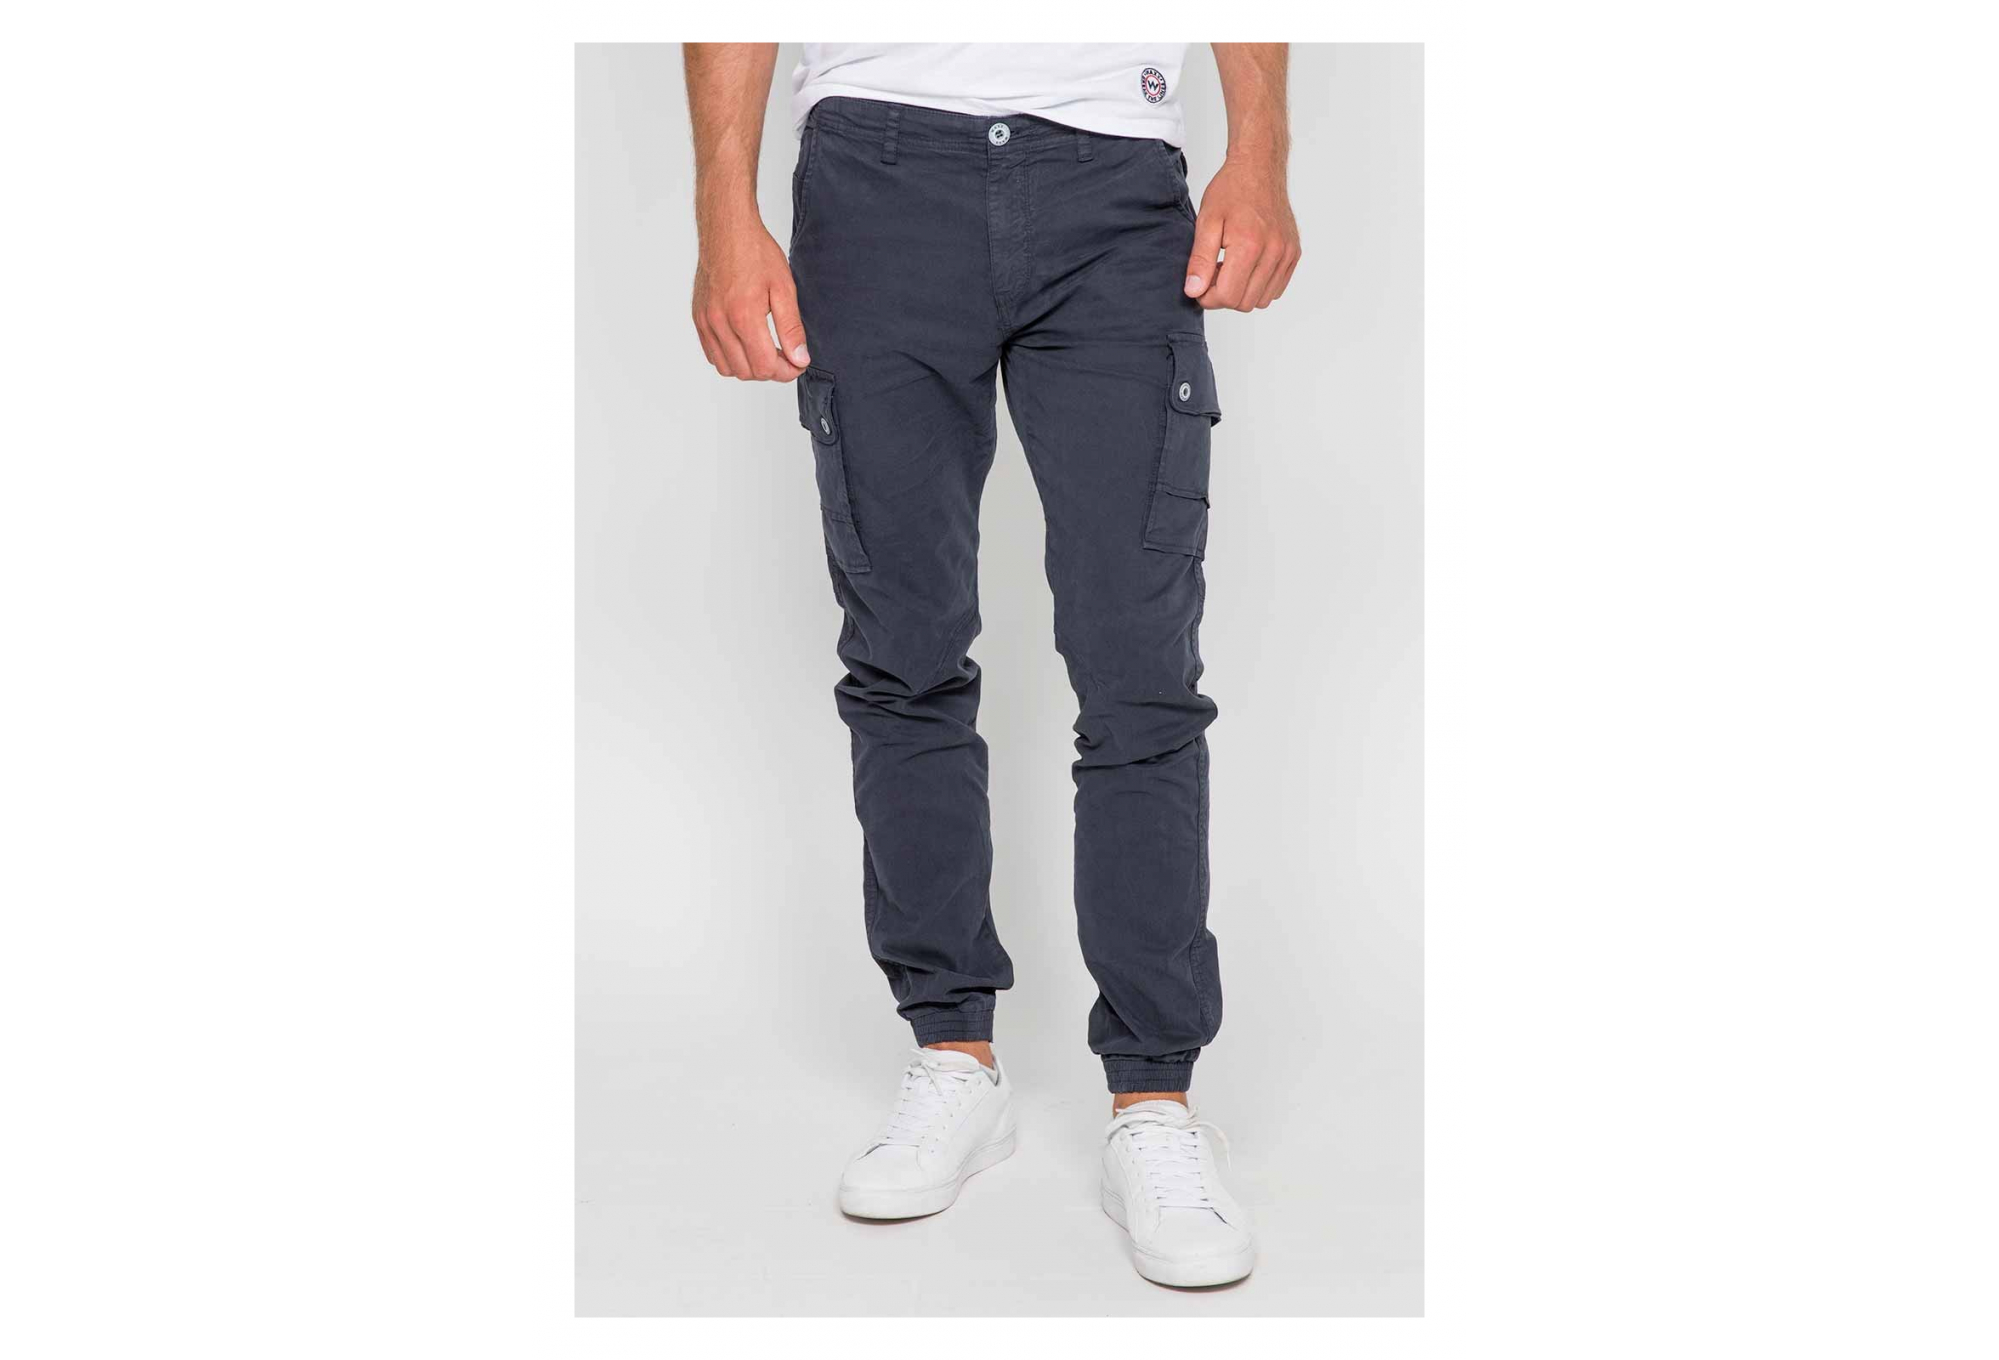 pretty cheap best selling limited guantity Pantalon Cargo Homme Noir